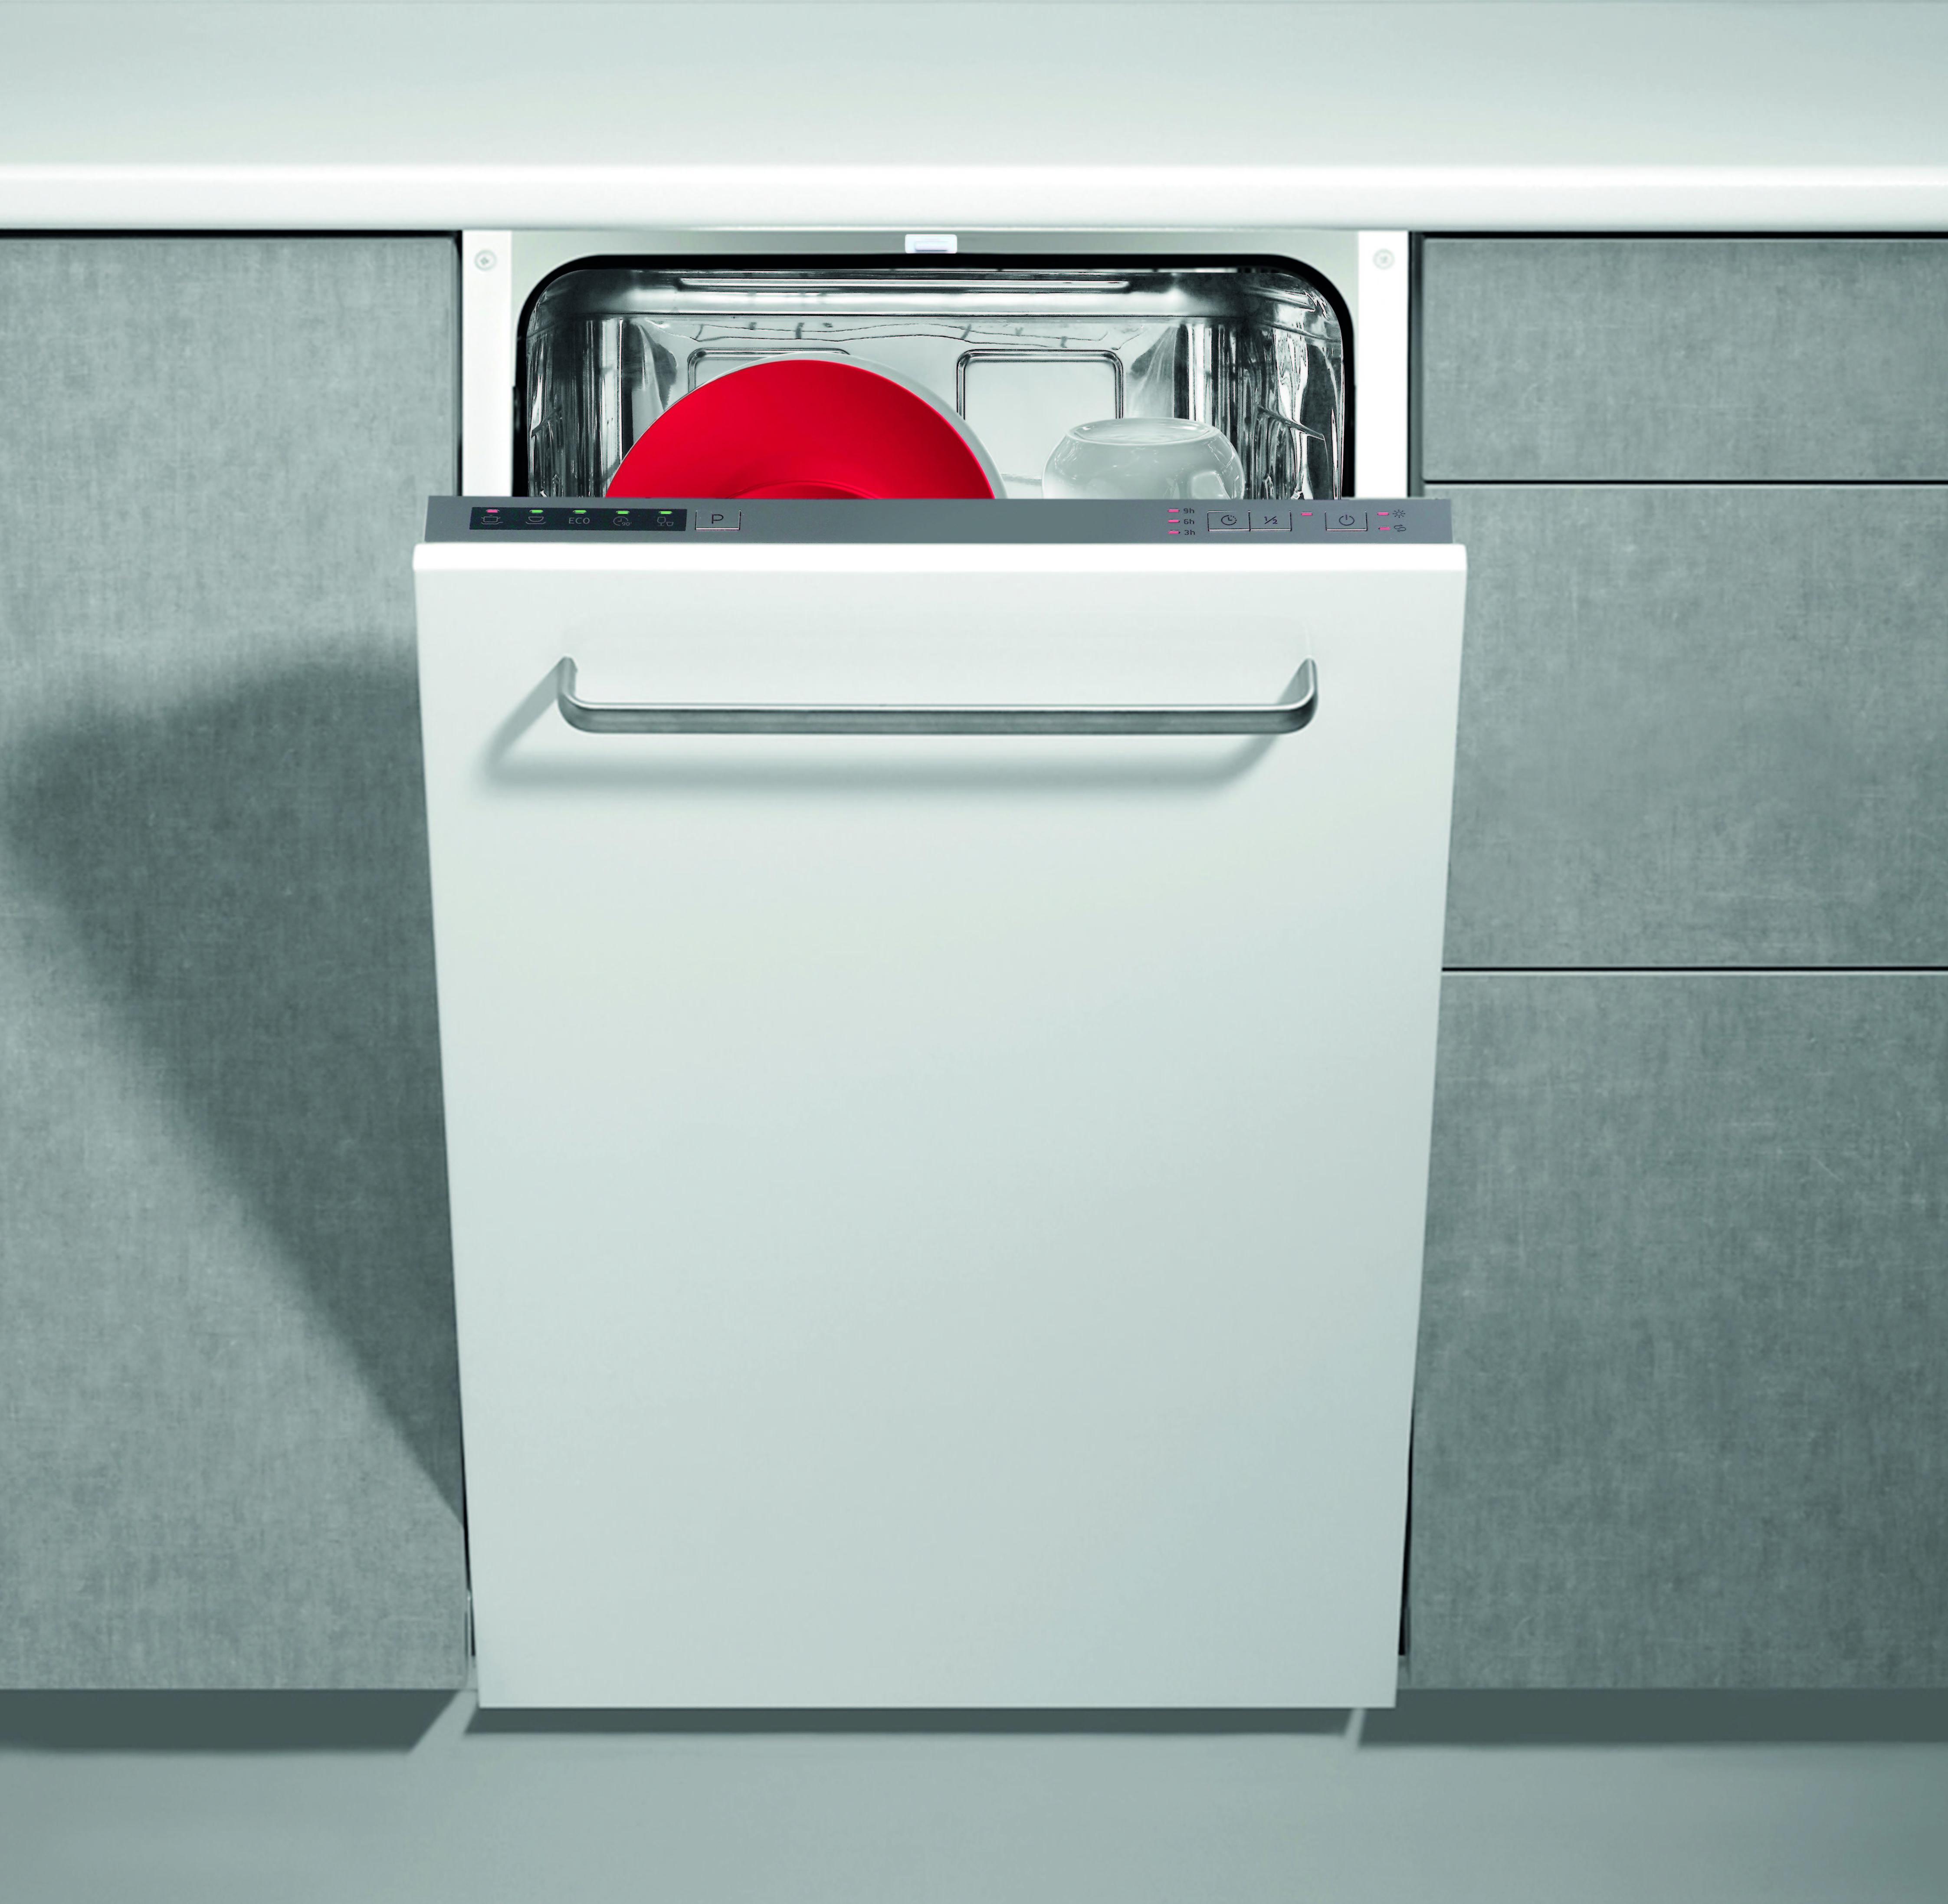 LAVAV. TEKA DW8 40FI 45/CM INT.TOTAL 9/P. A+ ---289€: Productos y Ofertas de Don Electrodomésticos Tienda online